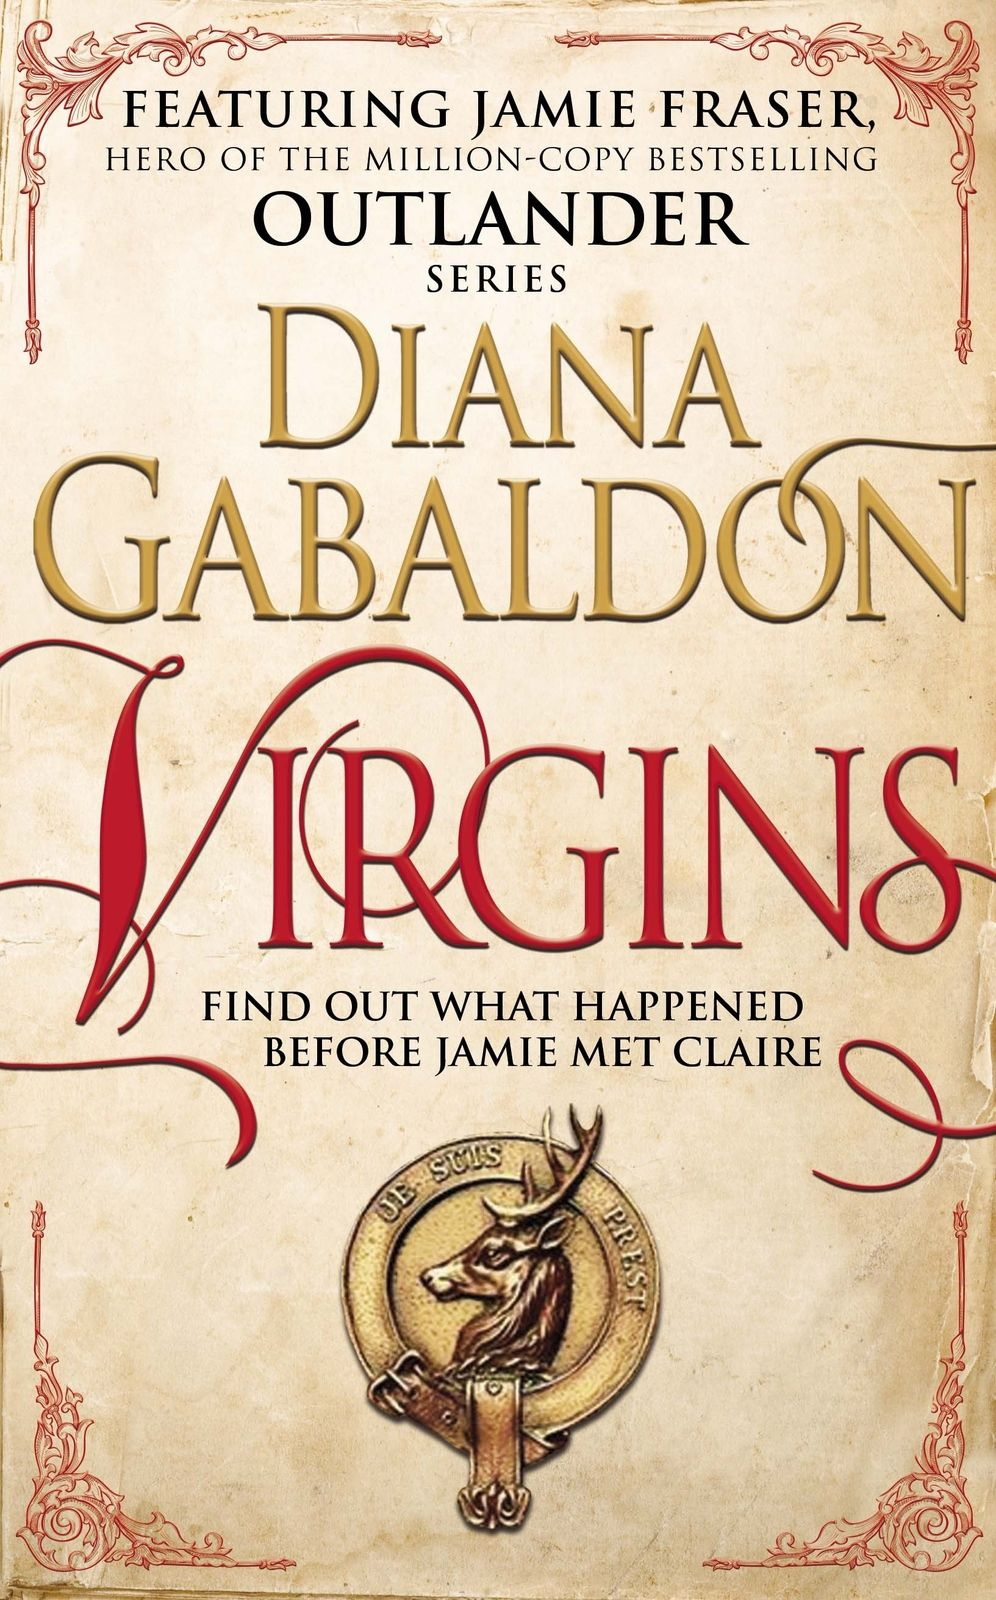 Virgins Image Outlander Diana Gabaldon Outlander Book